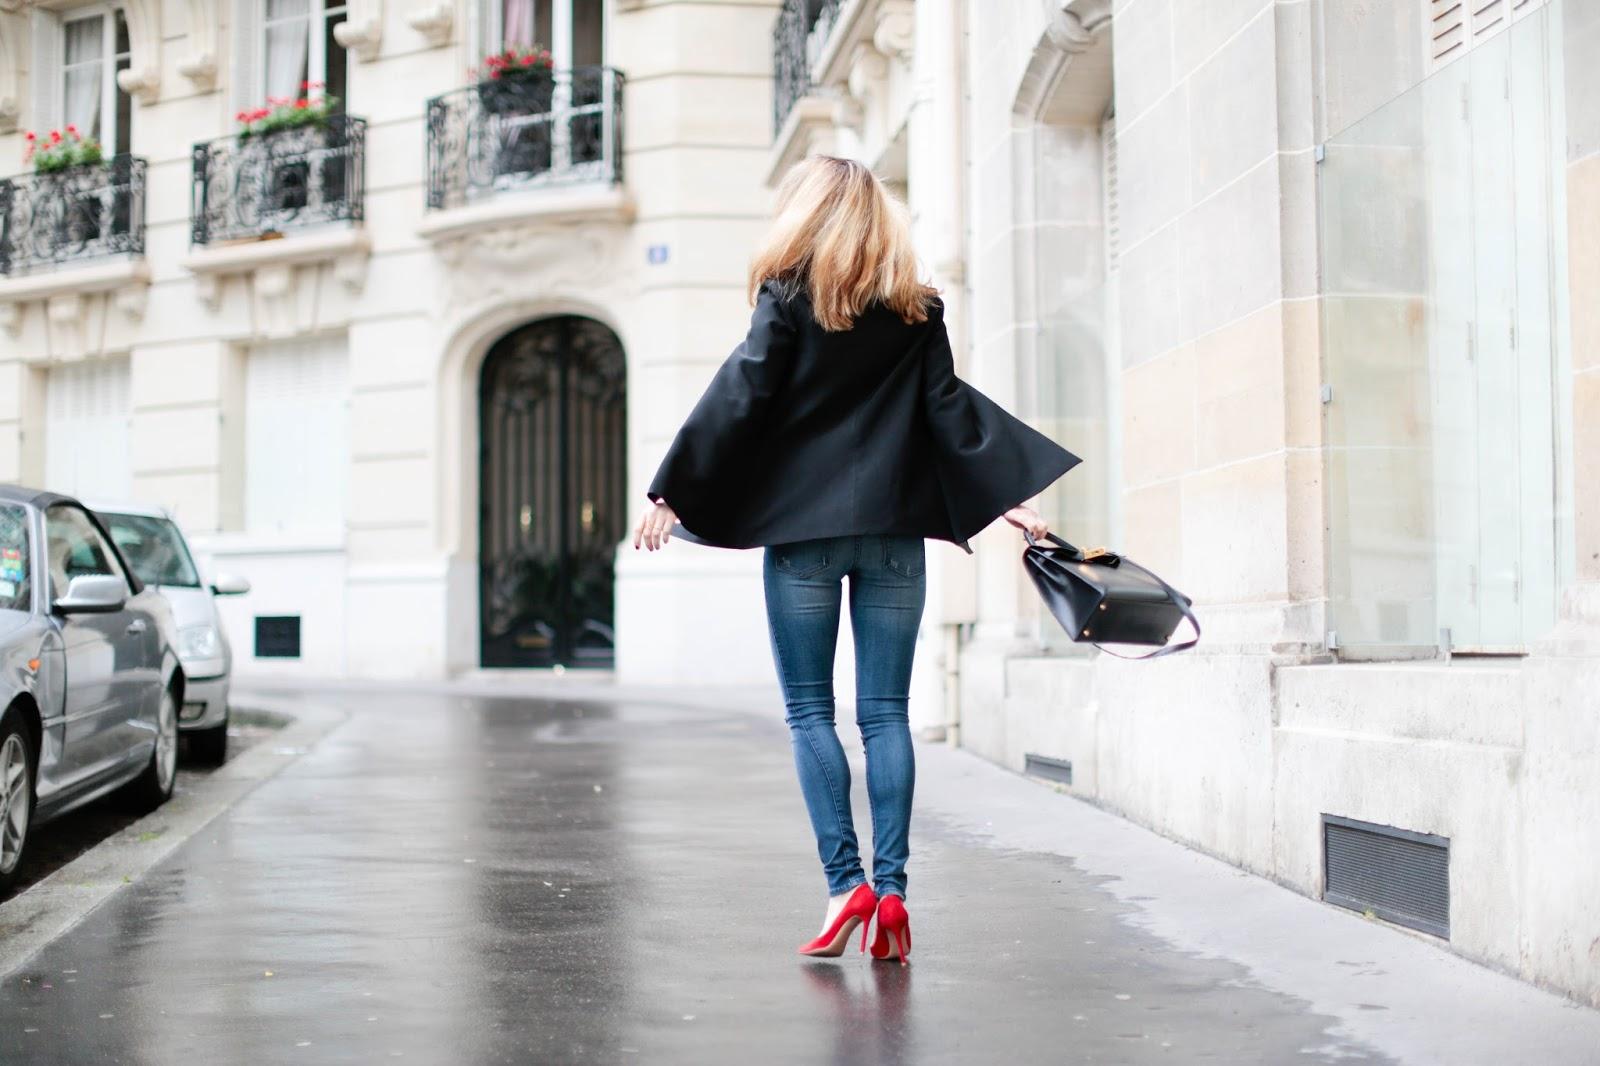 denim on denim, black orchid, topshop, hermès, gianvito rossi, streetstyle, paris, pardon my obsession